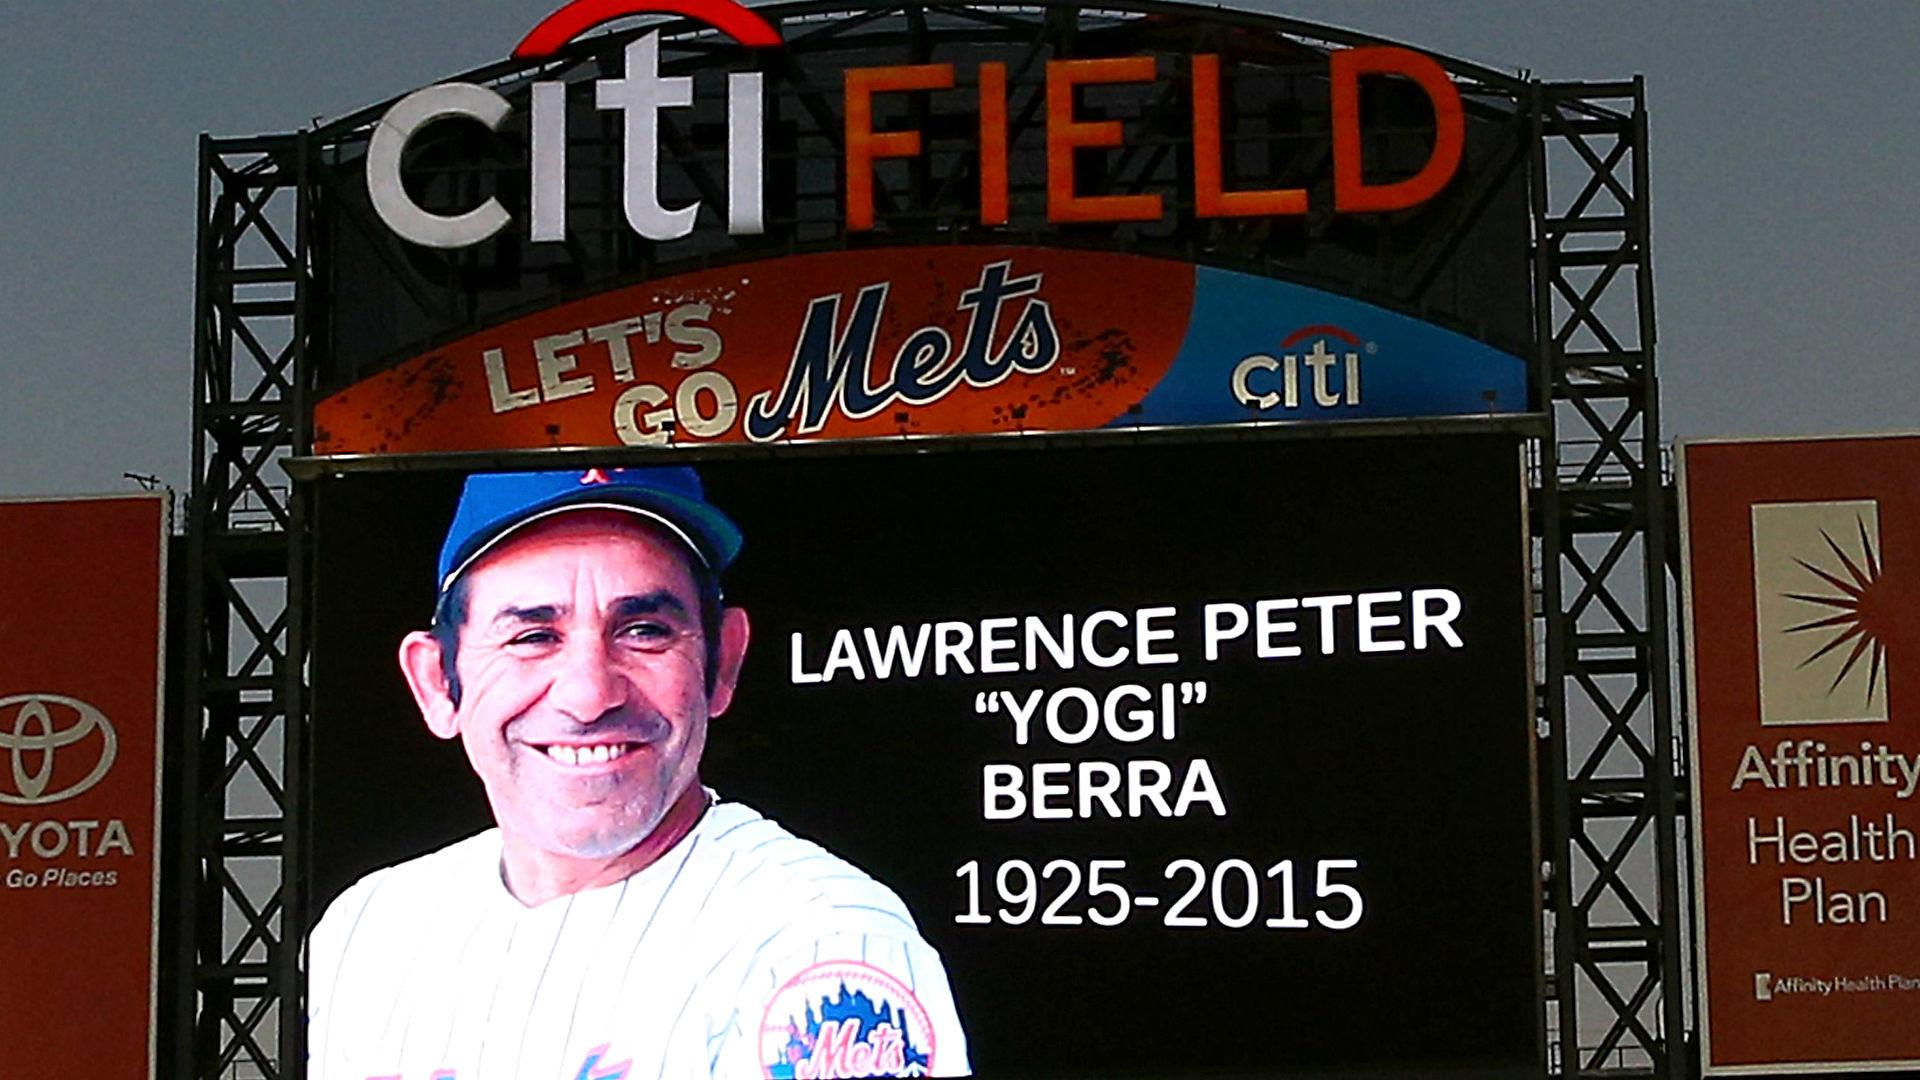 Yogi-Berra-Citi-Field-092315-Getty-FTR.jpg